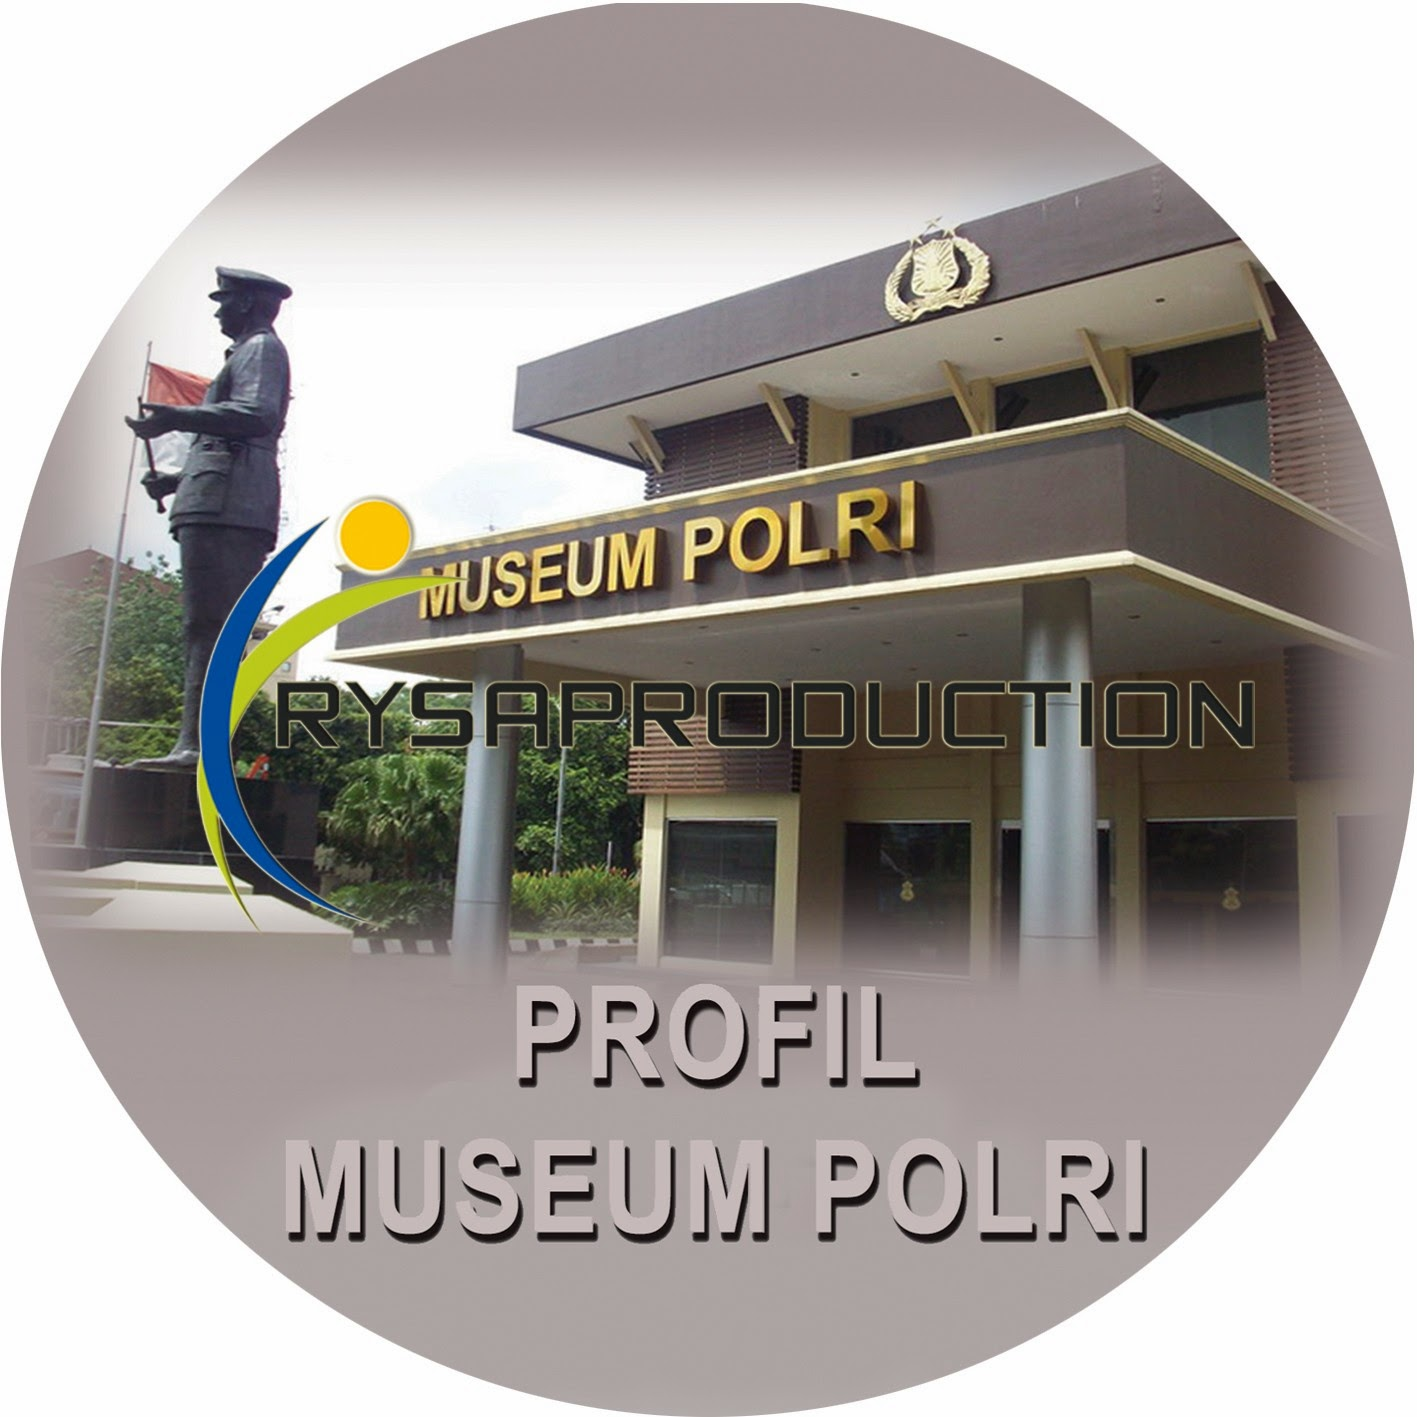 Profil Museum Polri